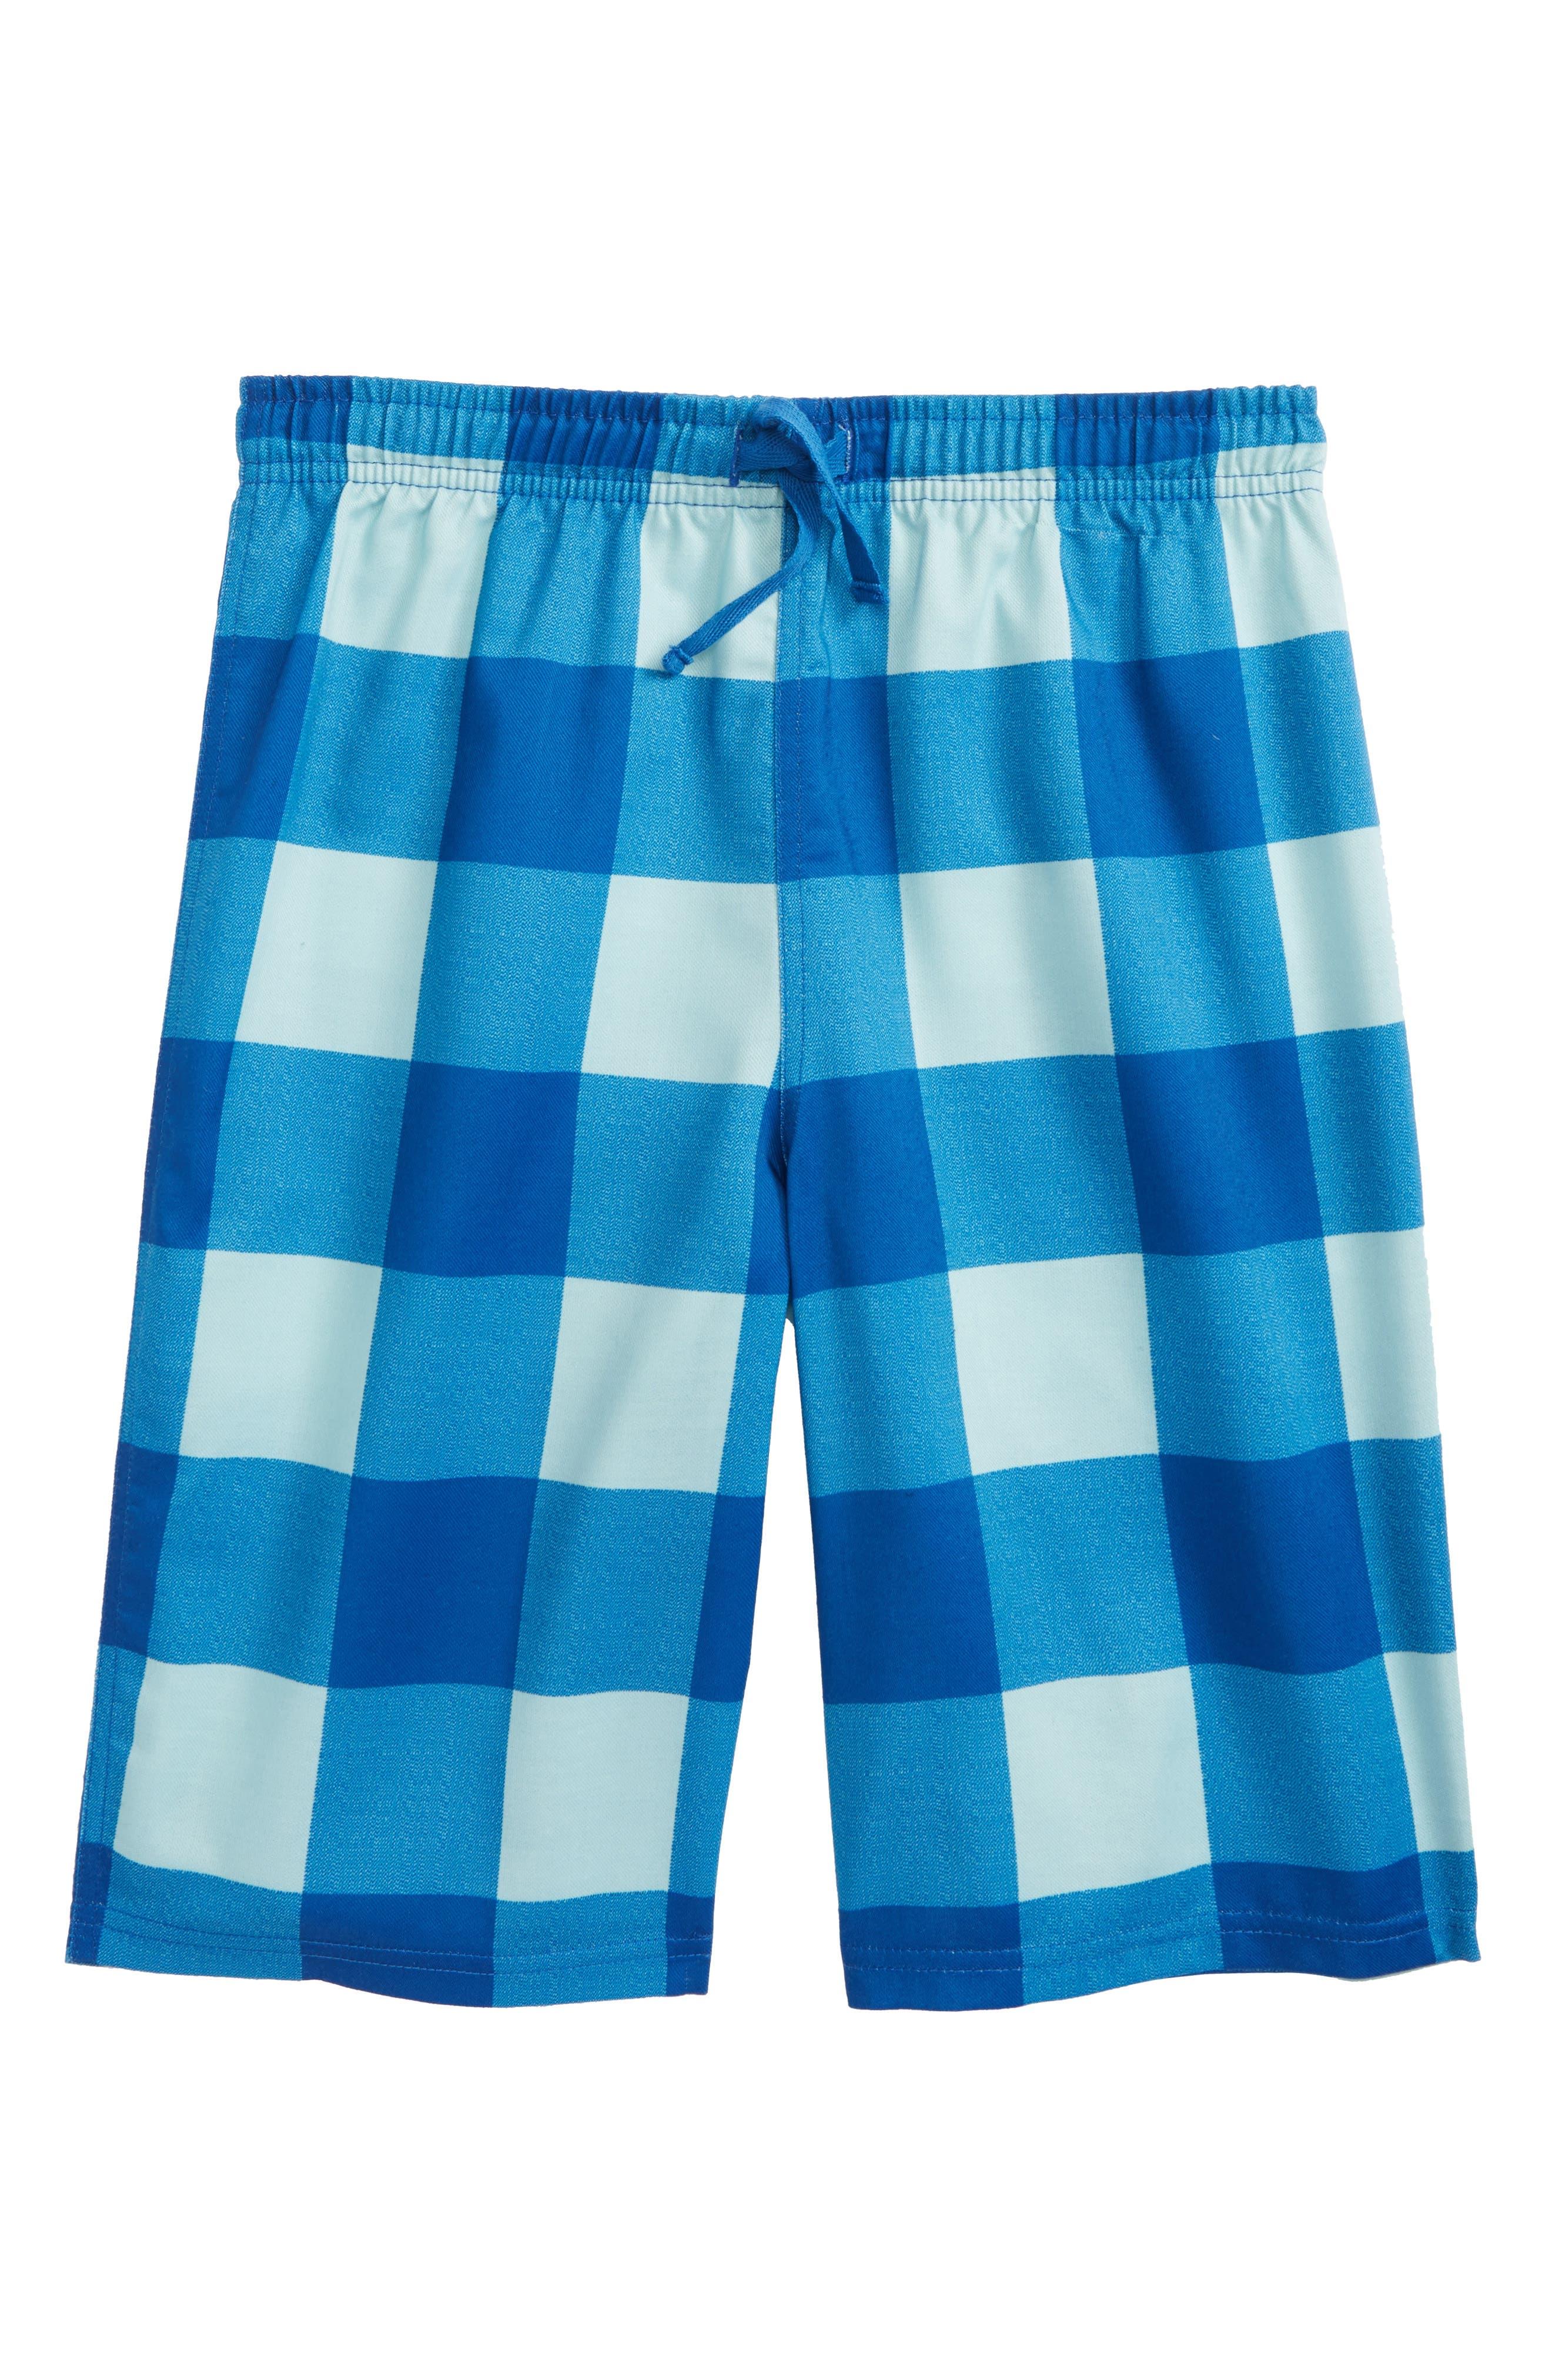 Flannel Shorts,                             Main thumbnail 1, color,                             401